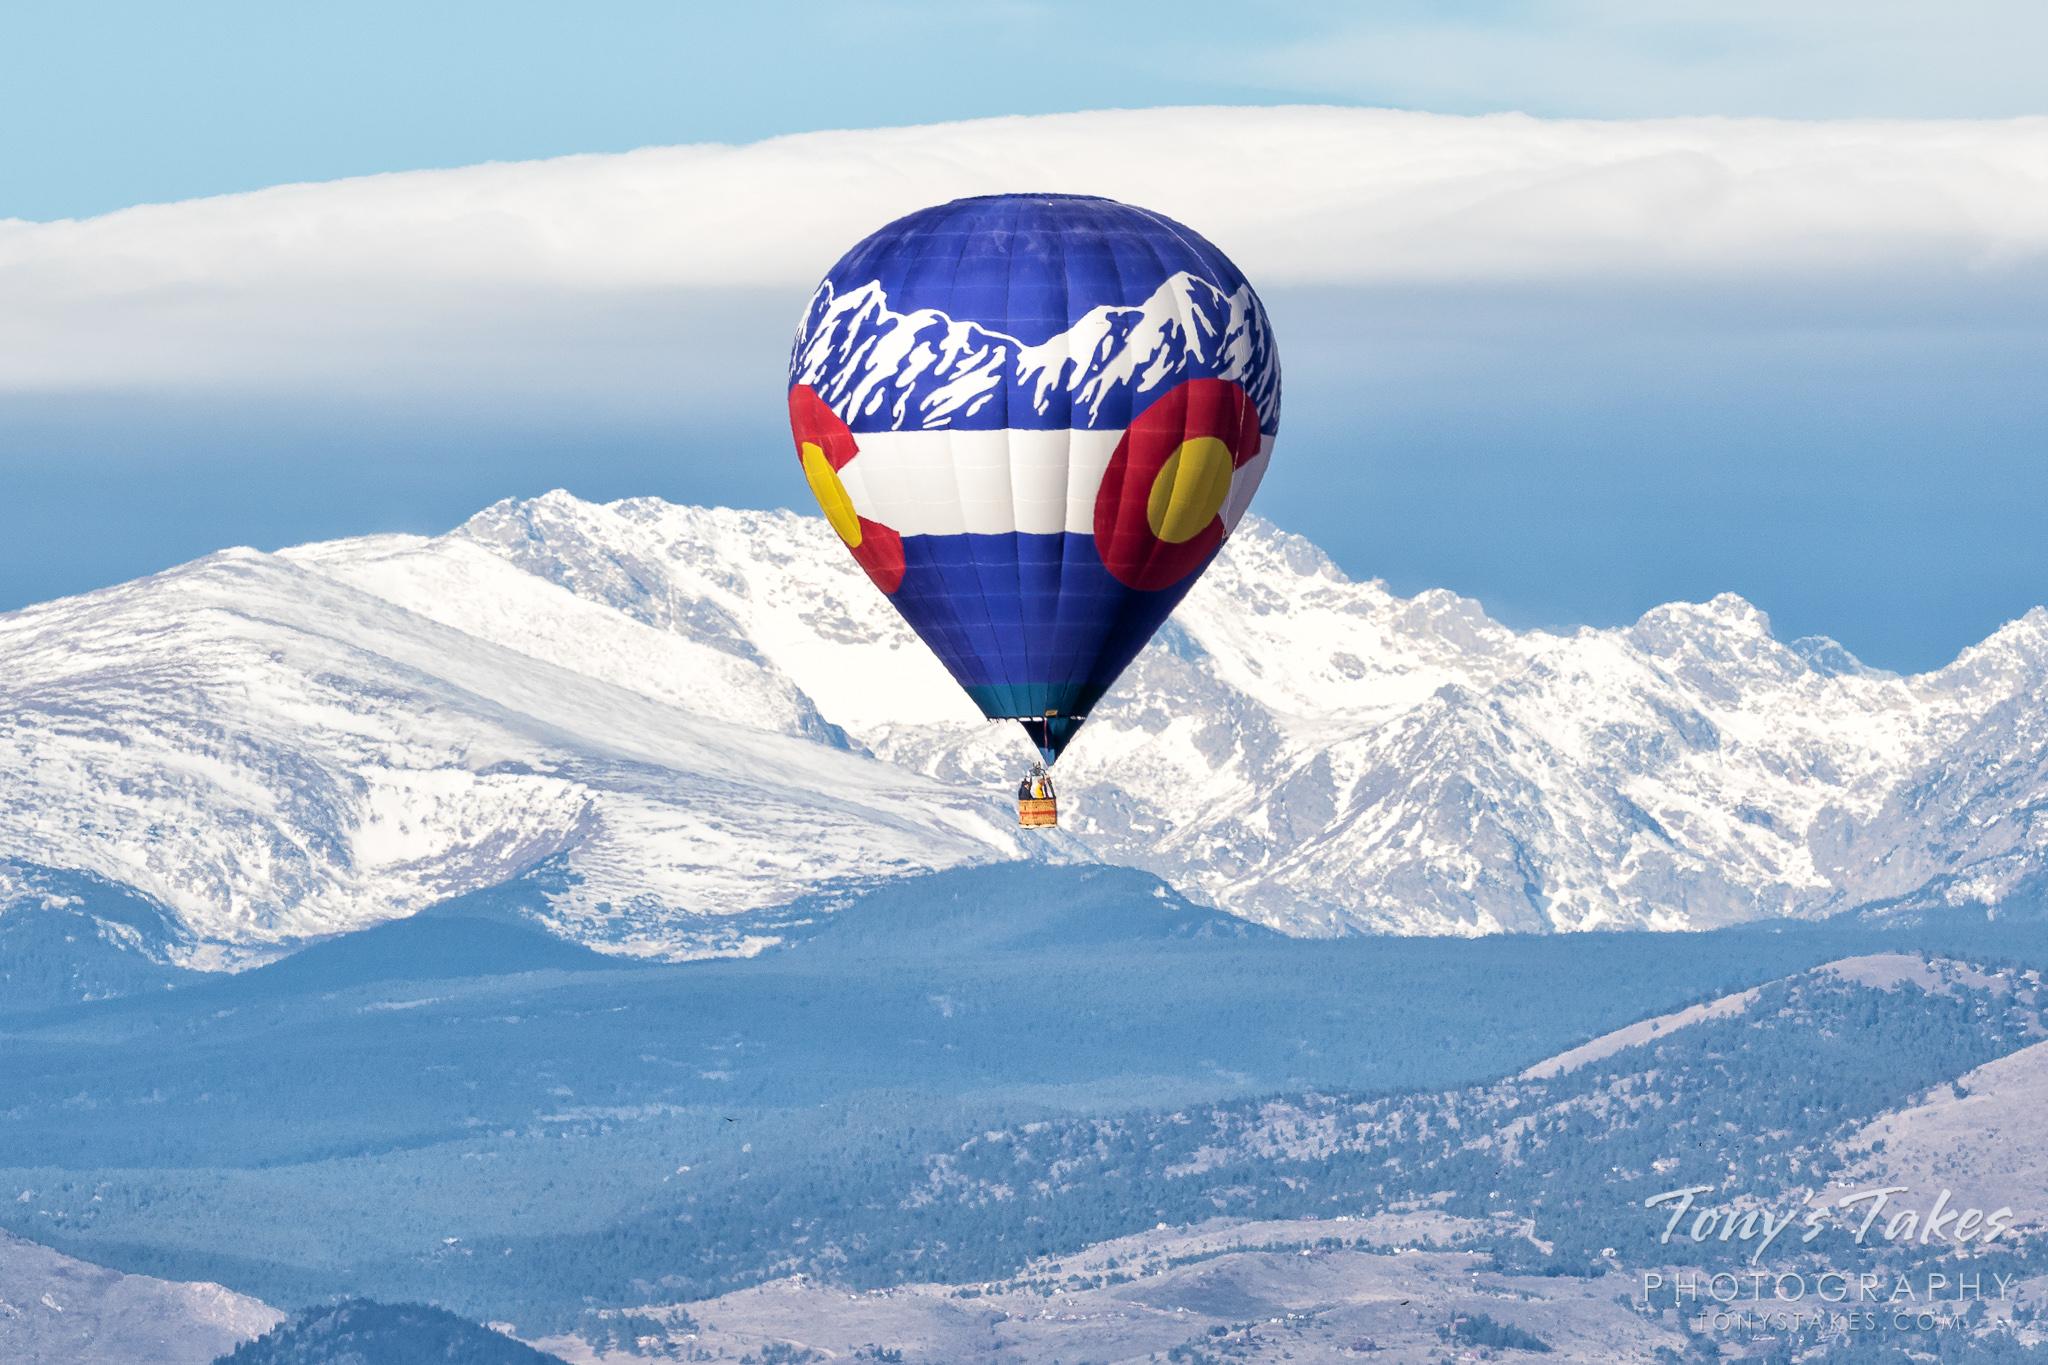 When art (or a hot air balloon) reflects nature